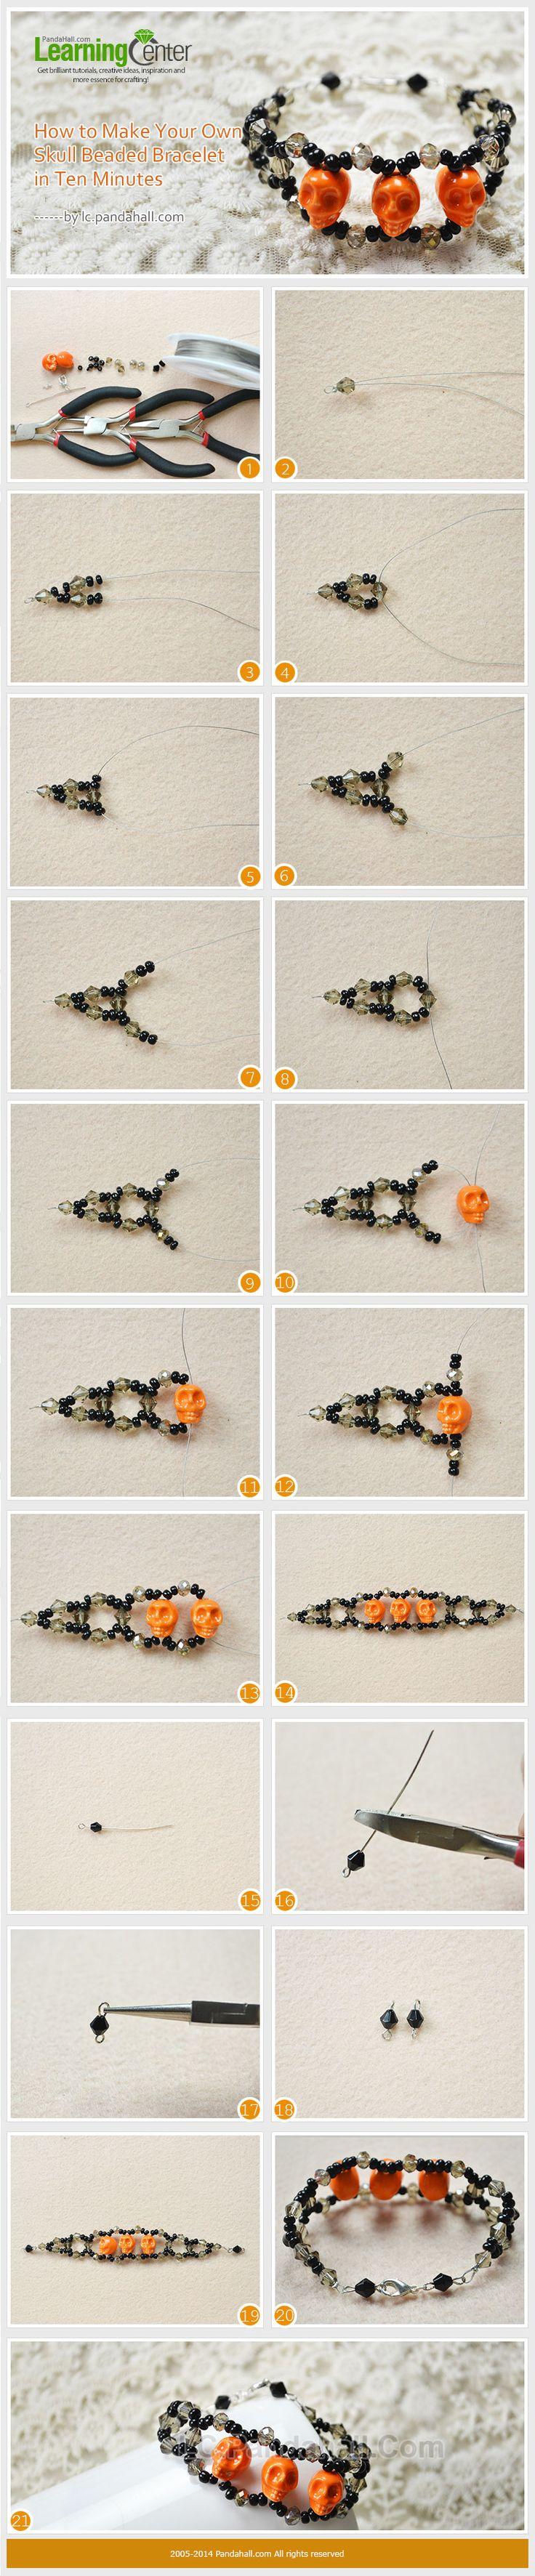 How to Make Your Own Skull Beaded Bracelet in Ten Minutes